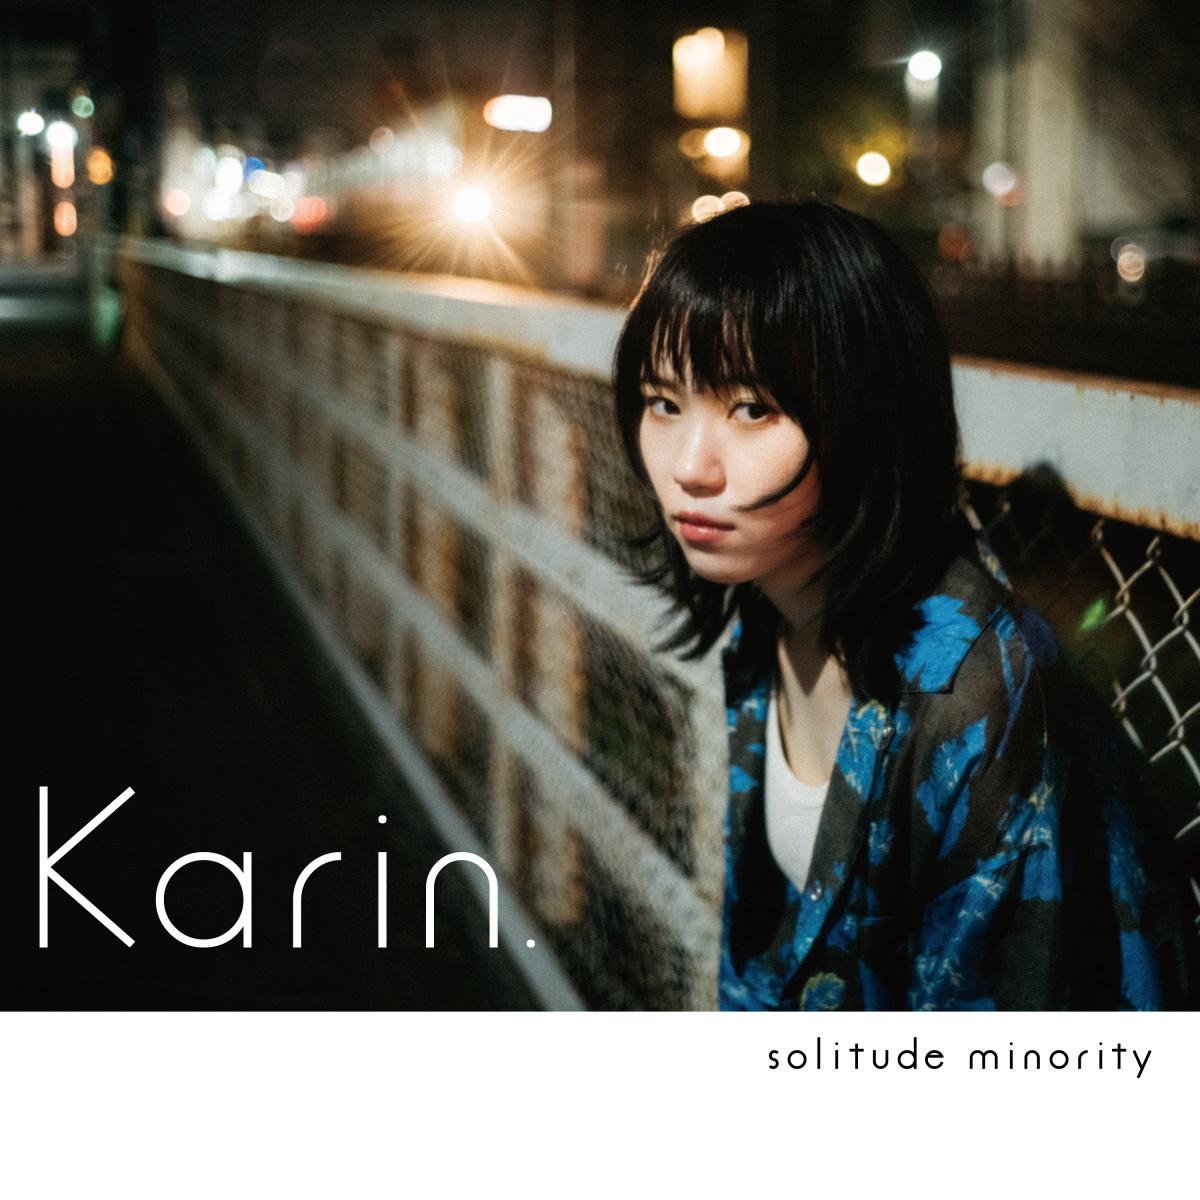 『Karin. - 信じること』収録の『solitude minority』ジャケット